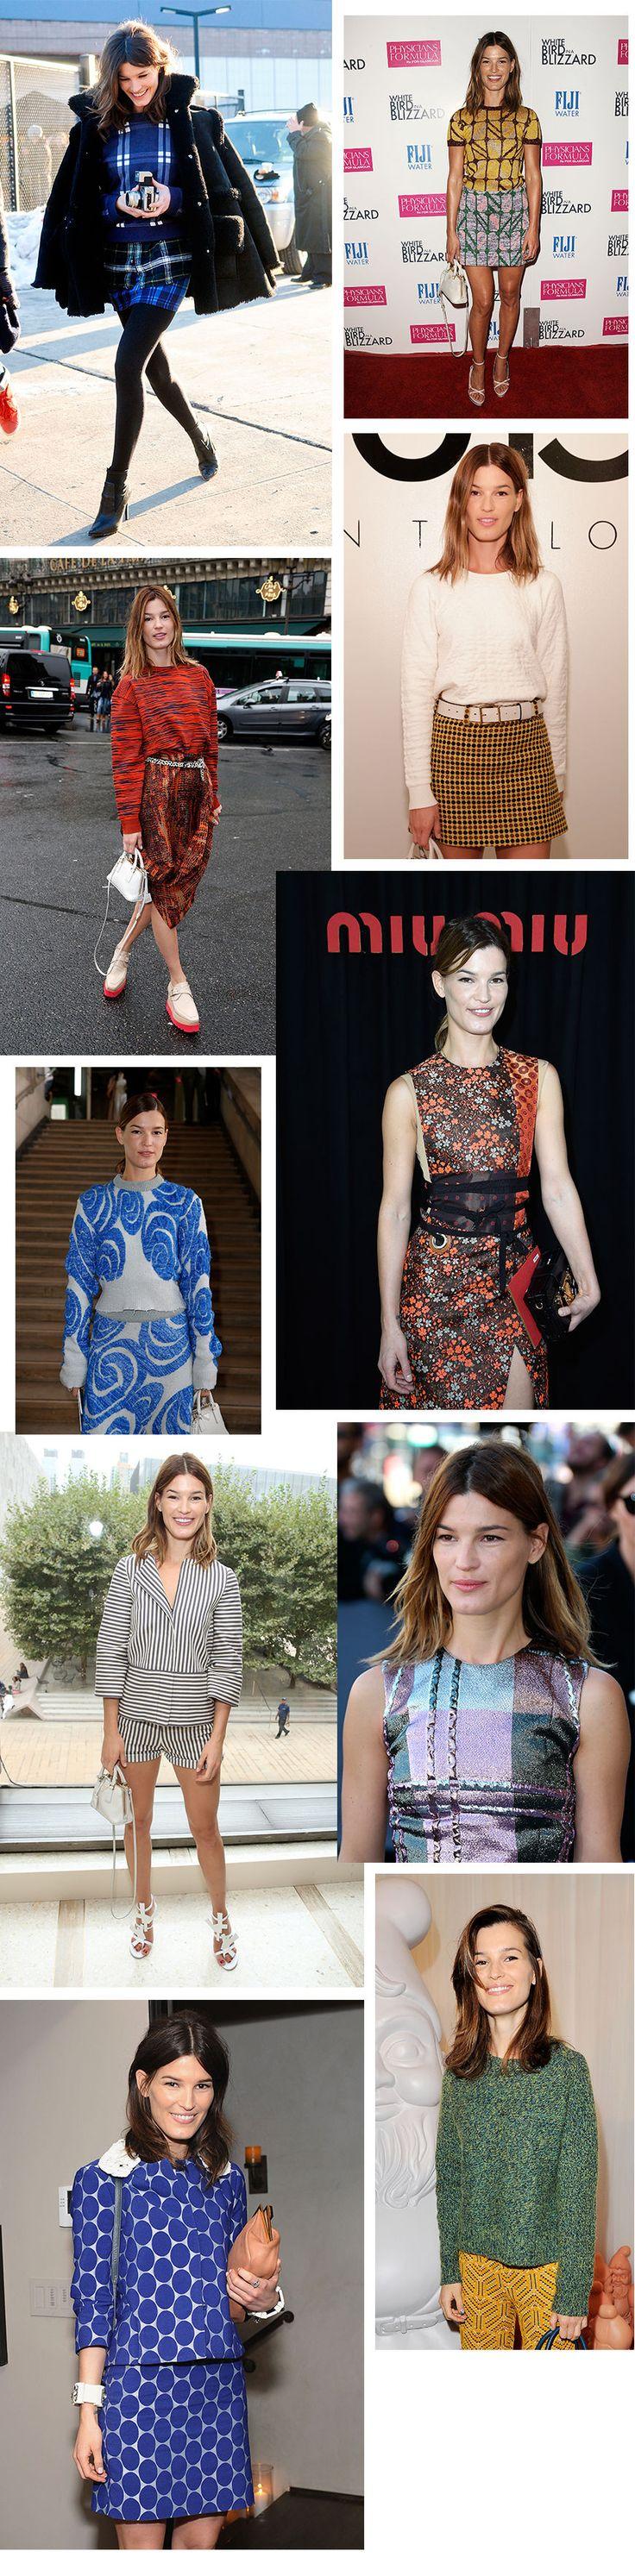 Shop stilen til Hanneli Mustaparta: mønstermix | Stylista.no Hanneli #hanneli #hannelimustaparta #style #stil #mote #fashion #fashionista #streetstyle  Mer mote på/ More fashion at  http://www.stylista.no